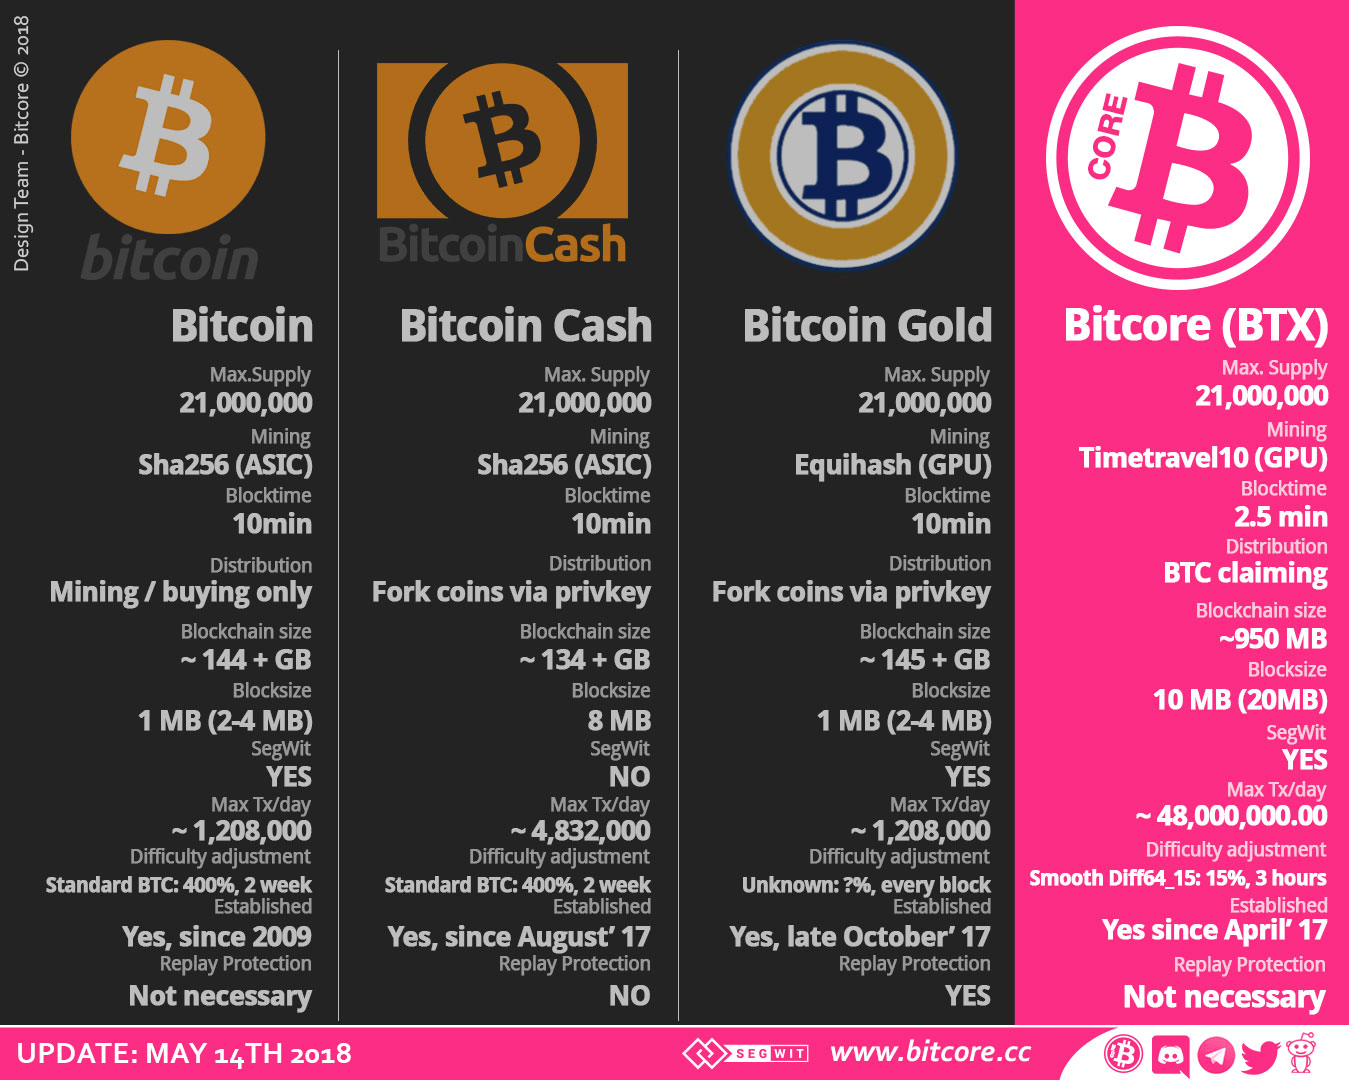 BitCore | BTX